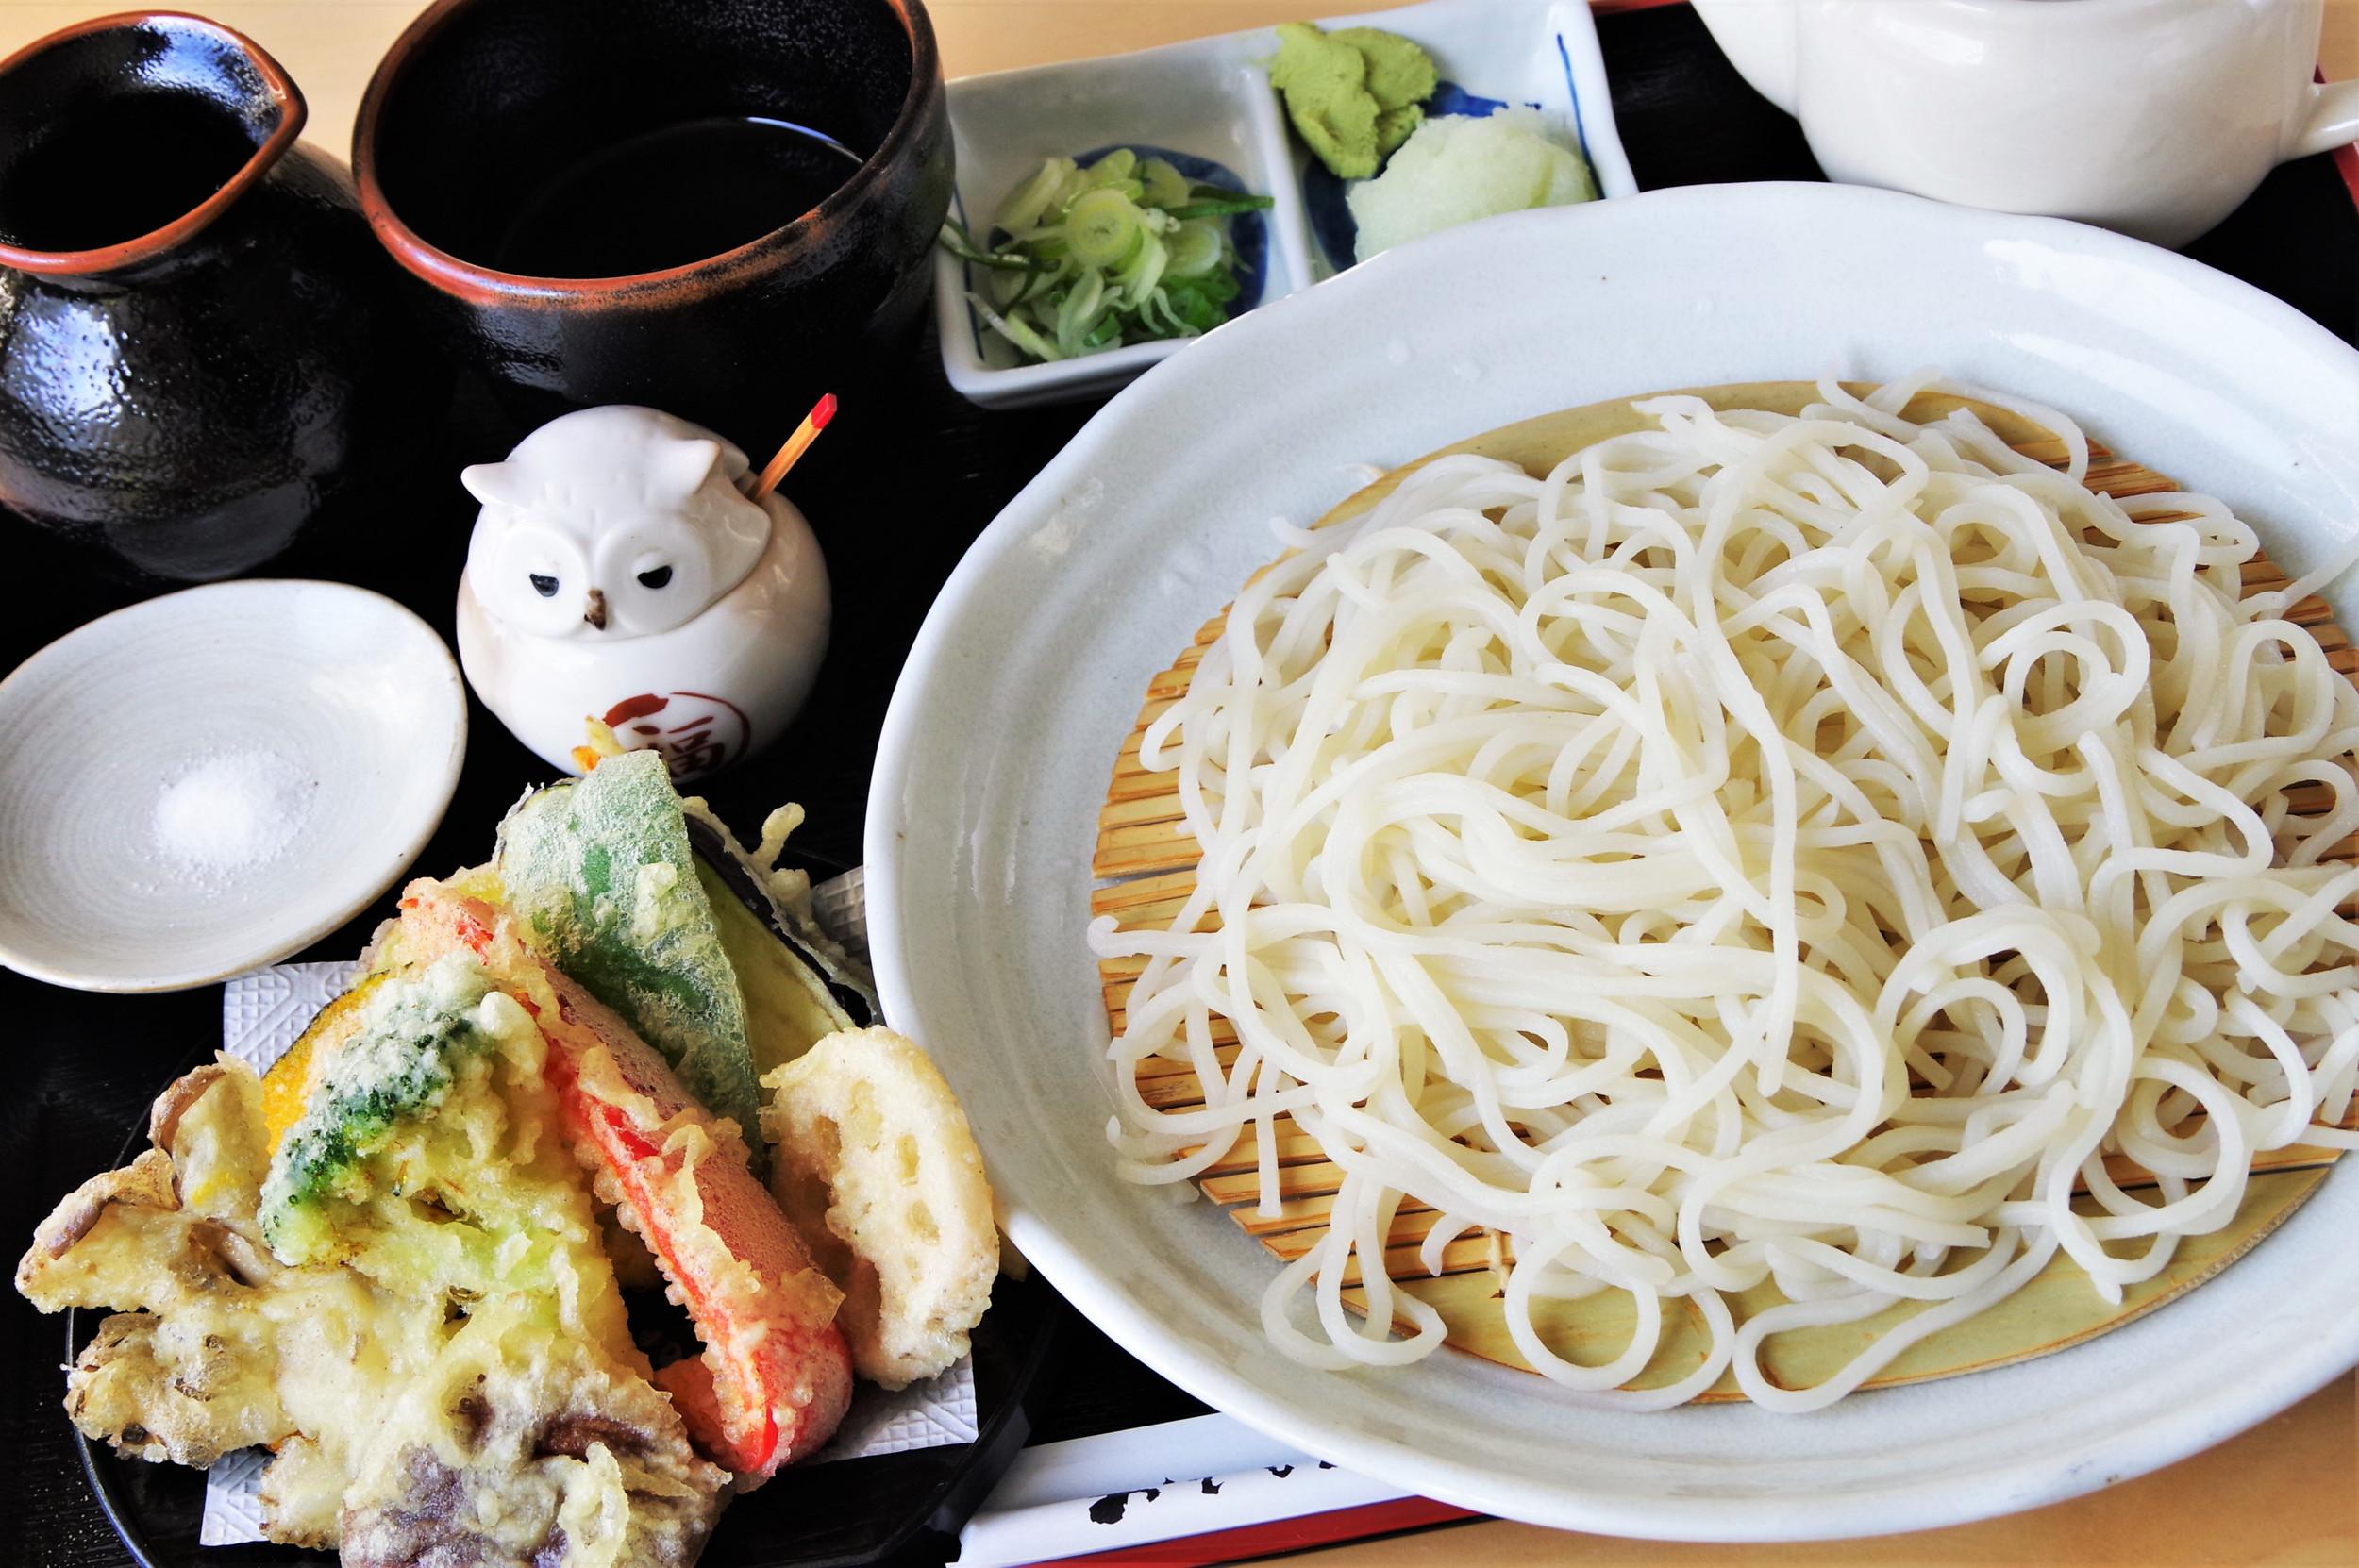 「季節の野菜天別添え蕎麦(更科蕎麦)」800円